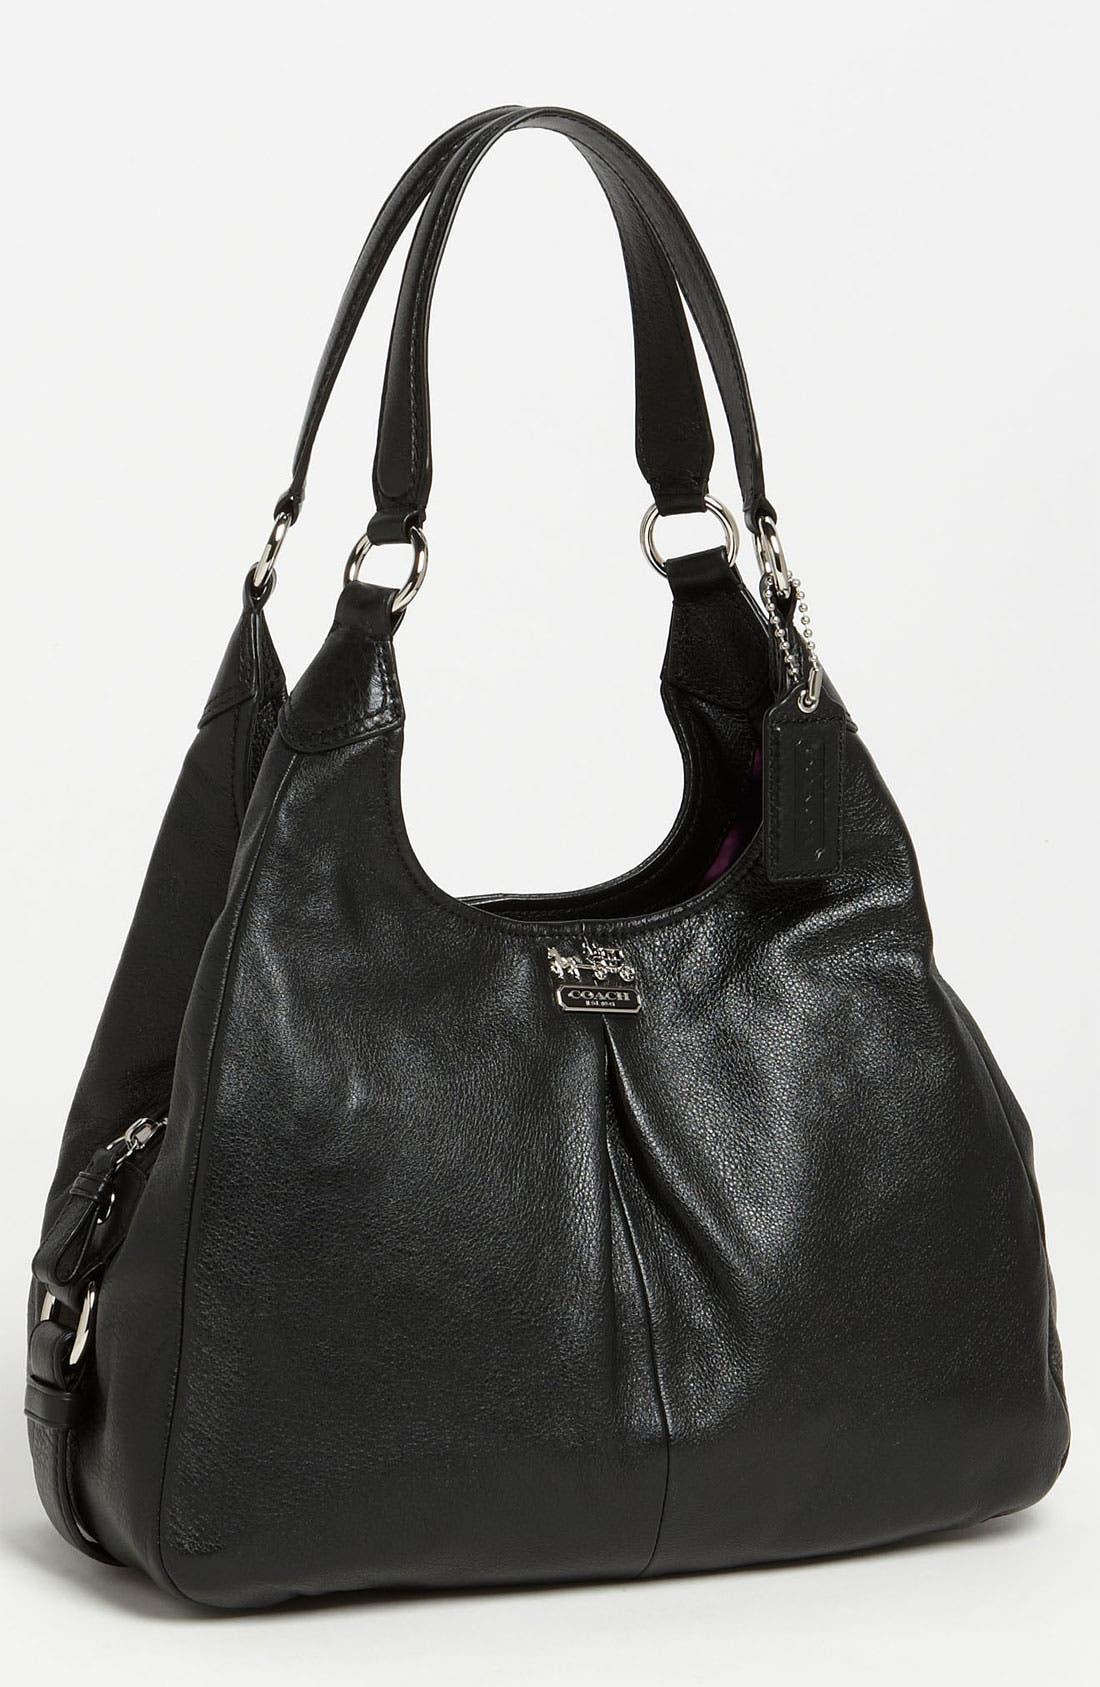 Main Image - COACH 'Madison - Maggie' Leather Hobo